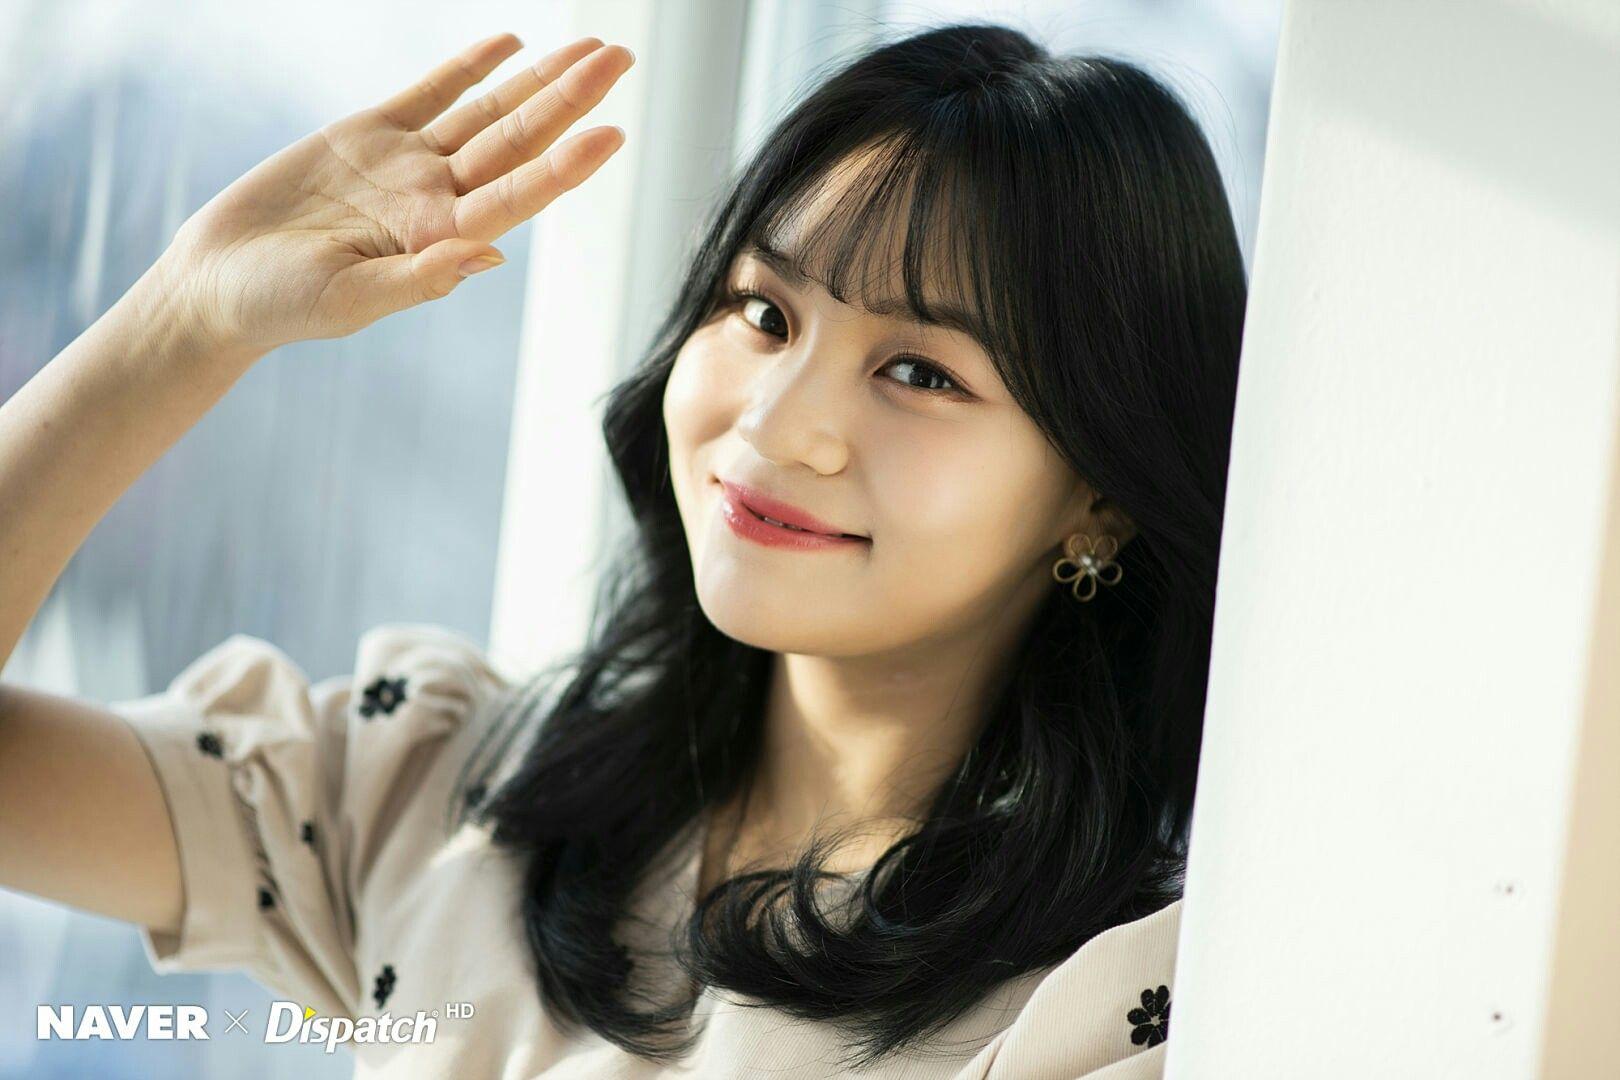 Pin By Han On Gfriend Naver X Dispatch Kpop Girl Groups G Friend Labyrinth